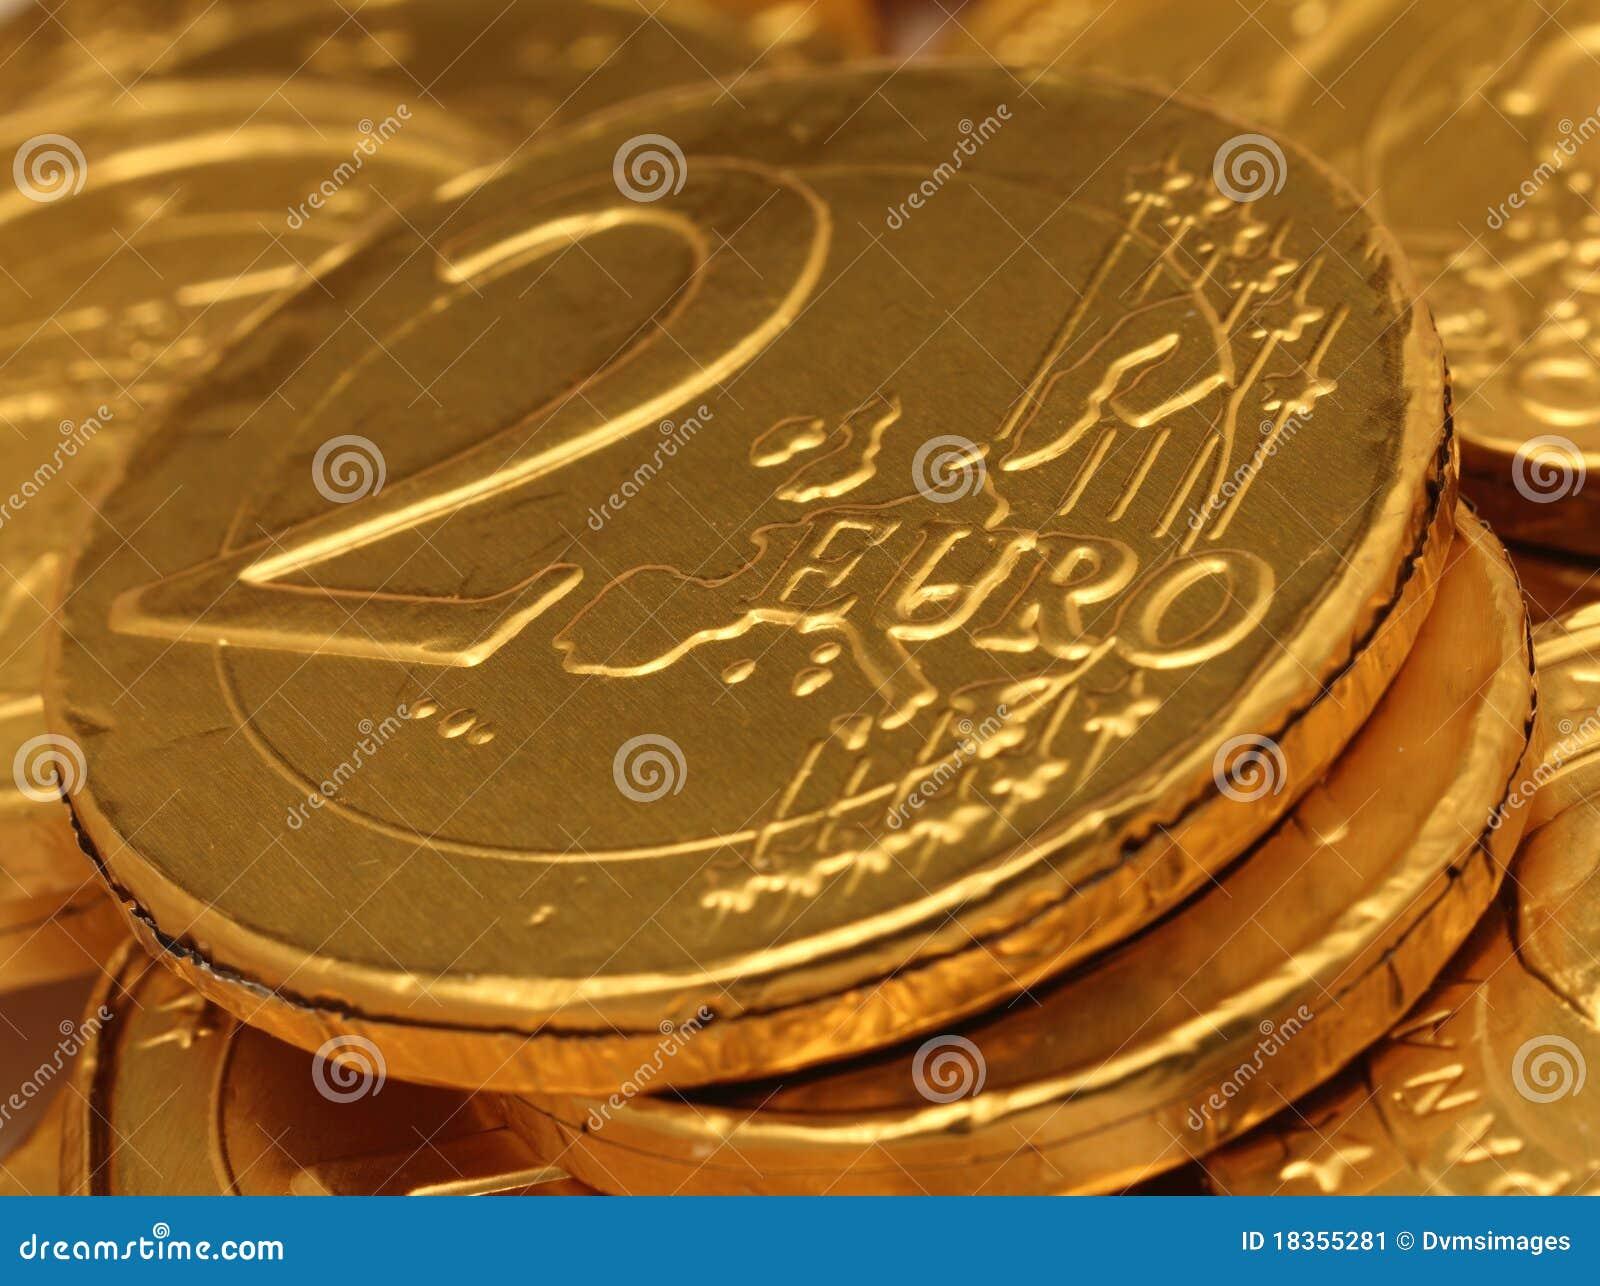 Euro Chocolate Coins Stock Image - Image: 18355281